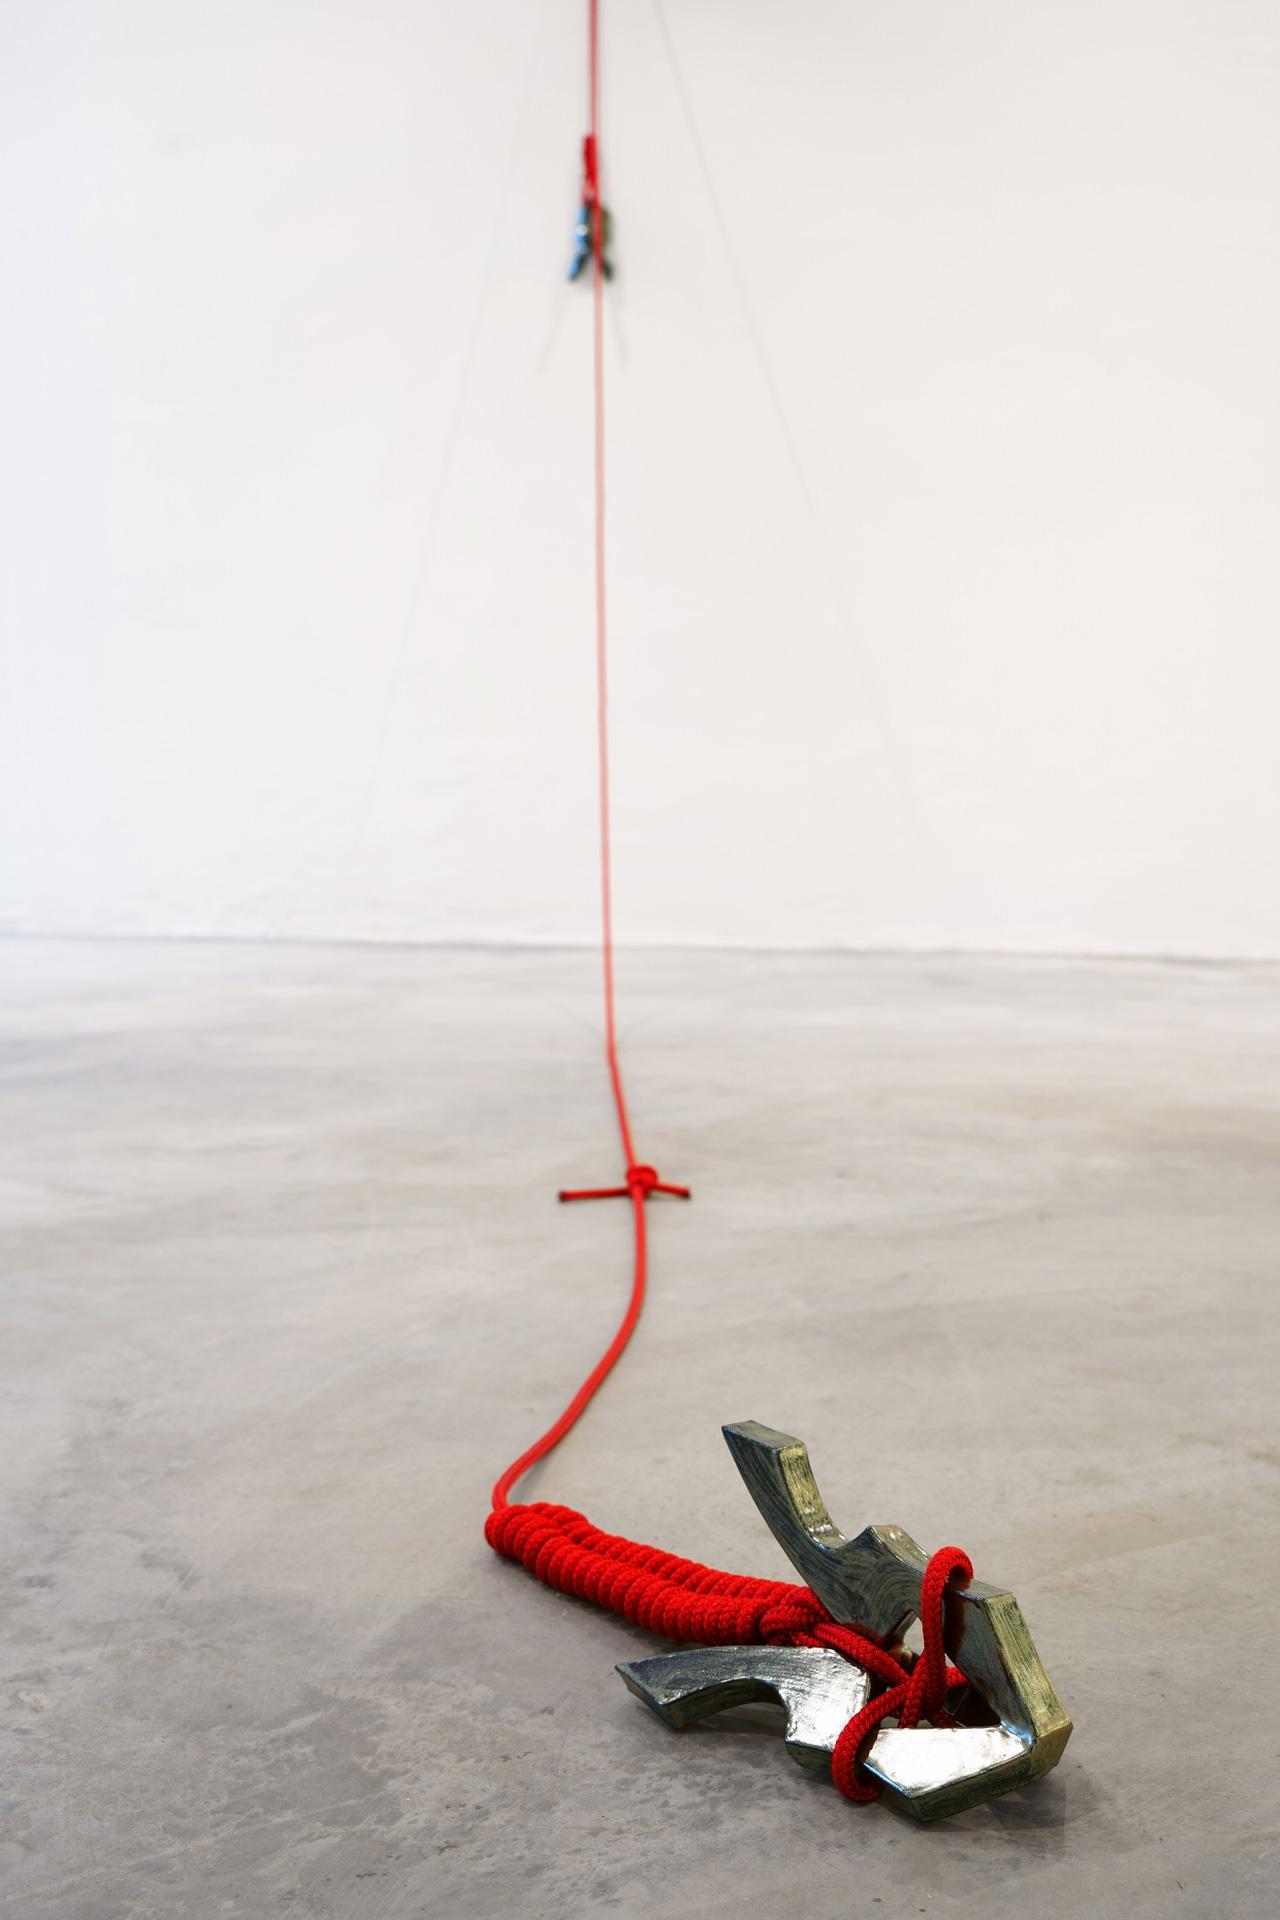 Timo Nasseri, Silverblack-Red Duo, 2019, Glazed ceramics and rope, 50 x 21 x 21 cm